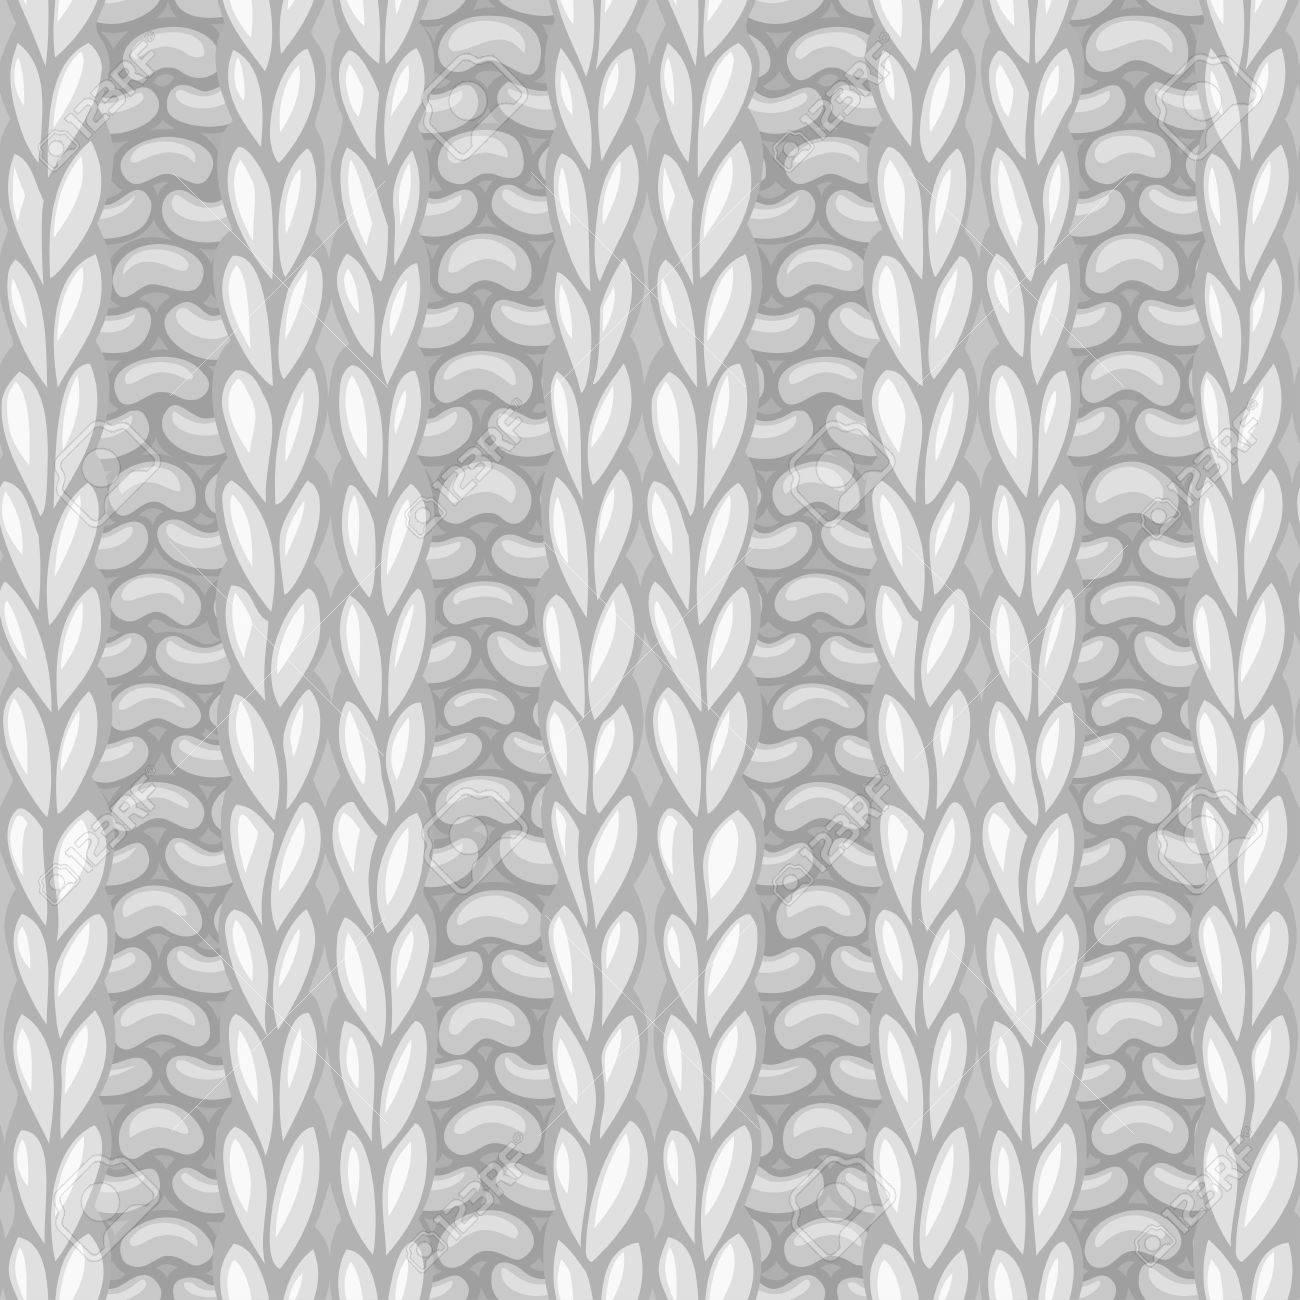 Seamless Knitting Pattern. 2x2 Rib Texture. Vector High Detailed ...